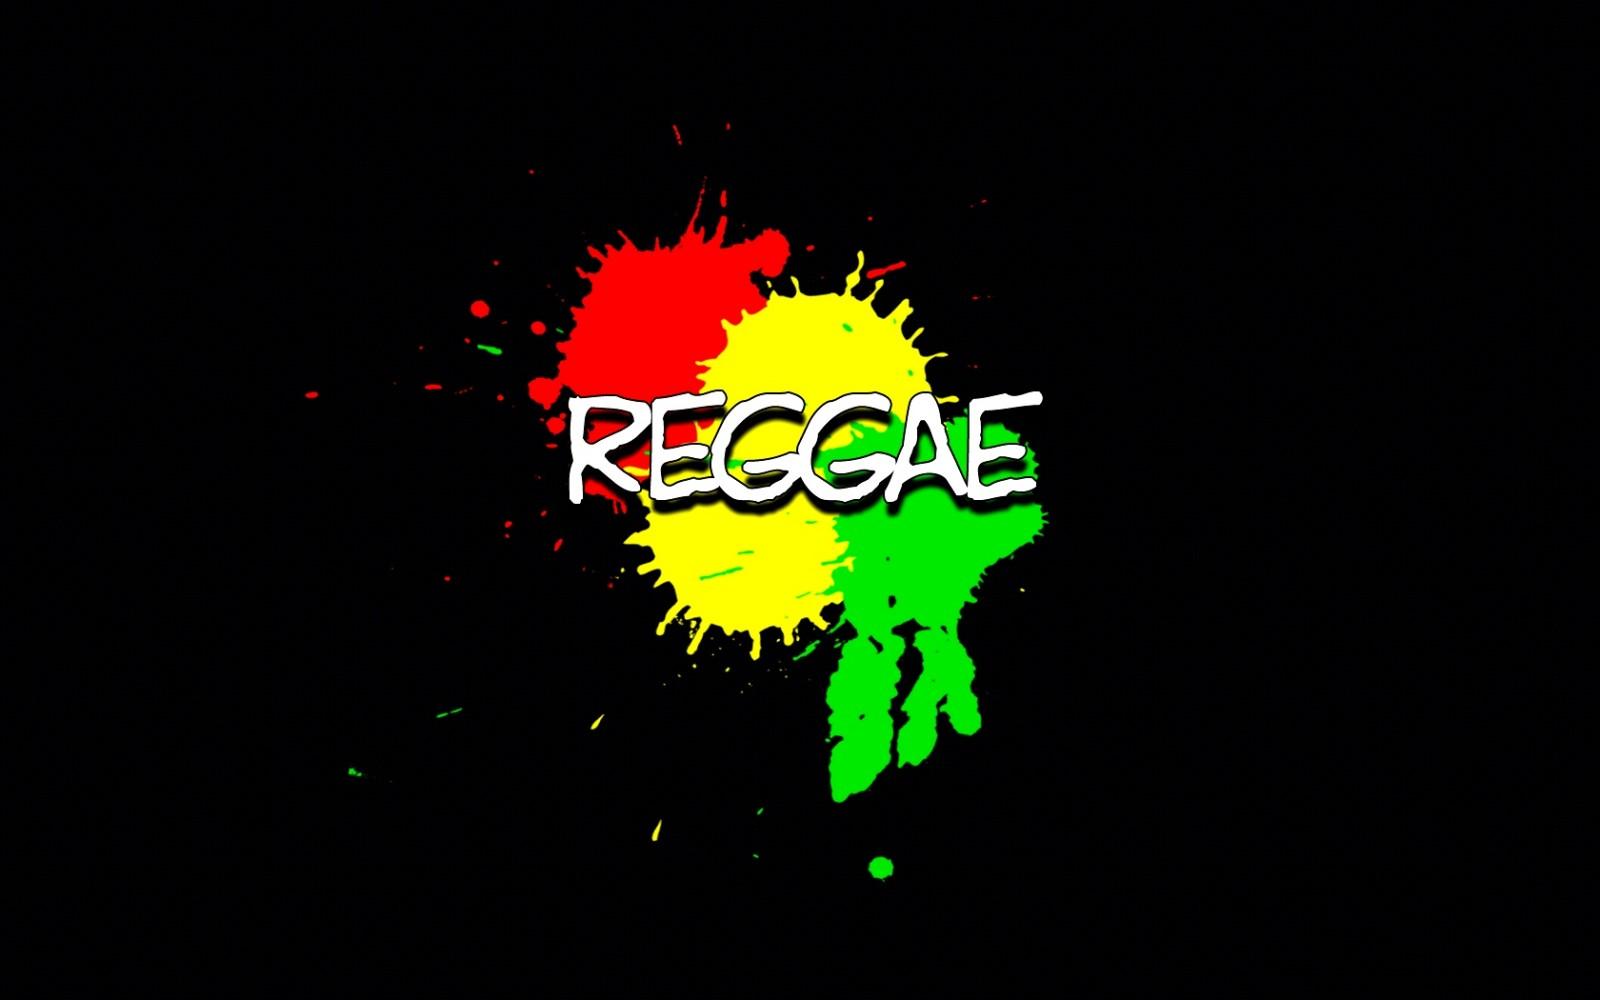 hd reggae wallpapers reggae iphone wallpaper hd wallpapers hd 1080p 1600x1000